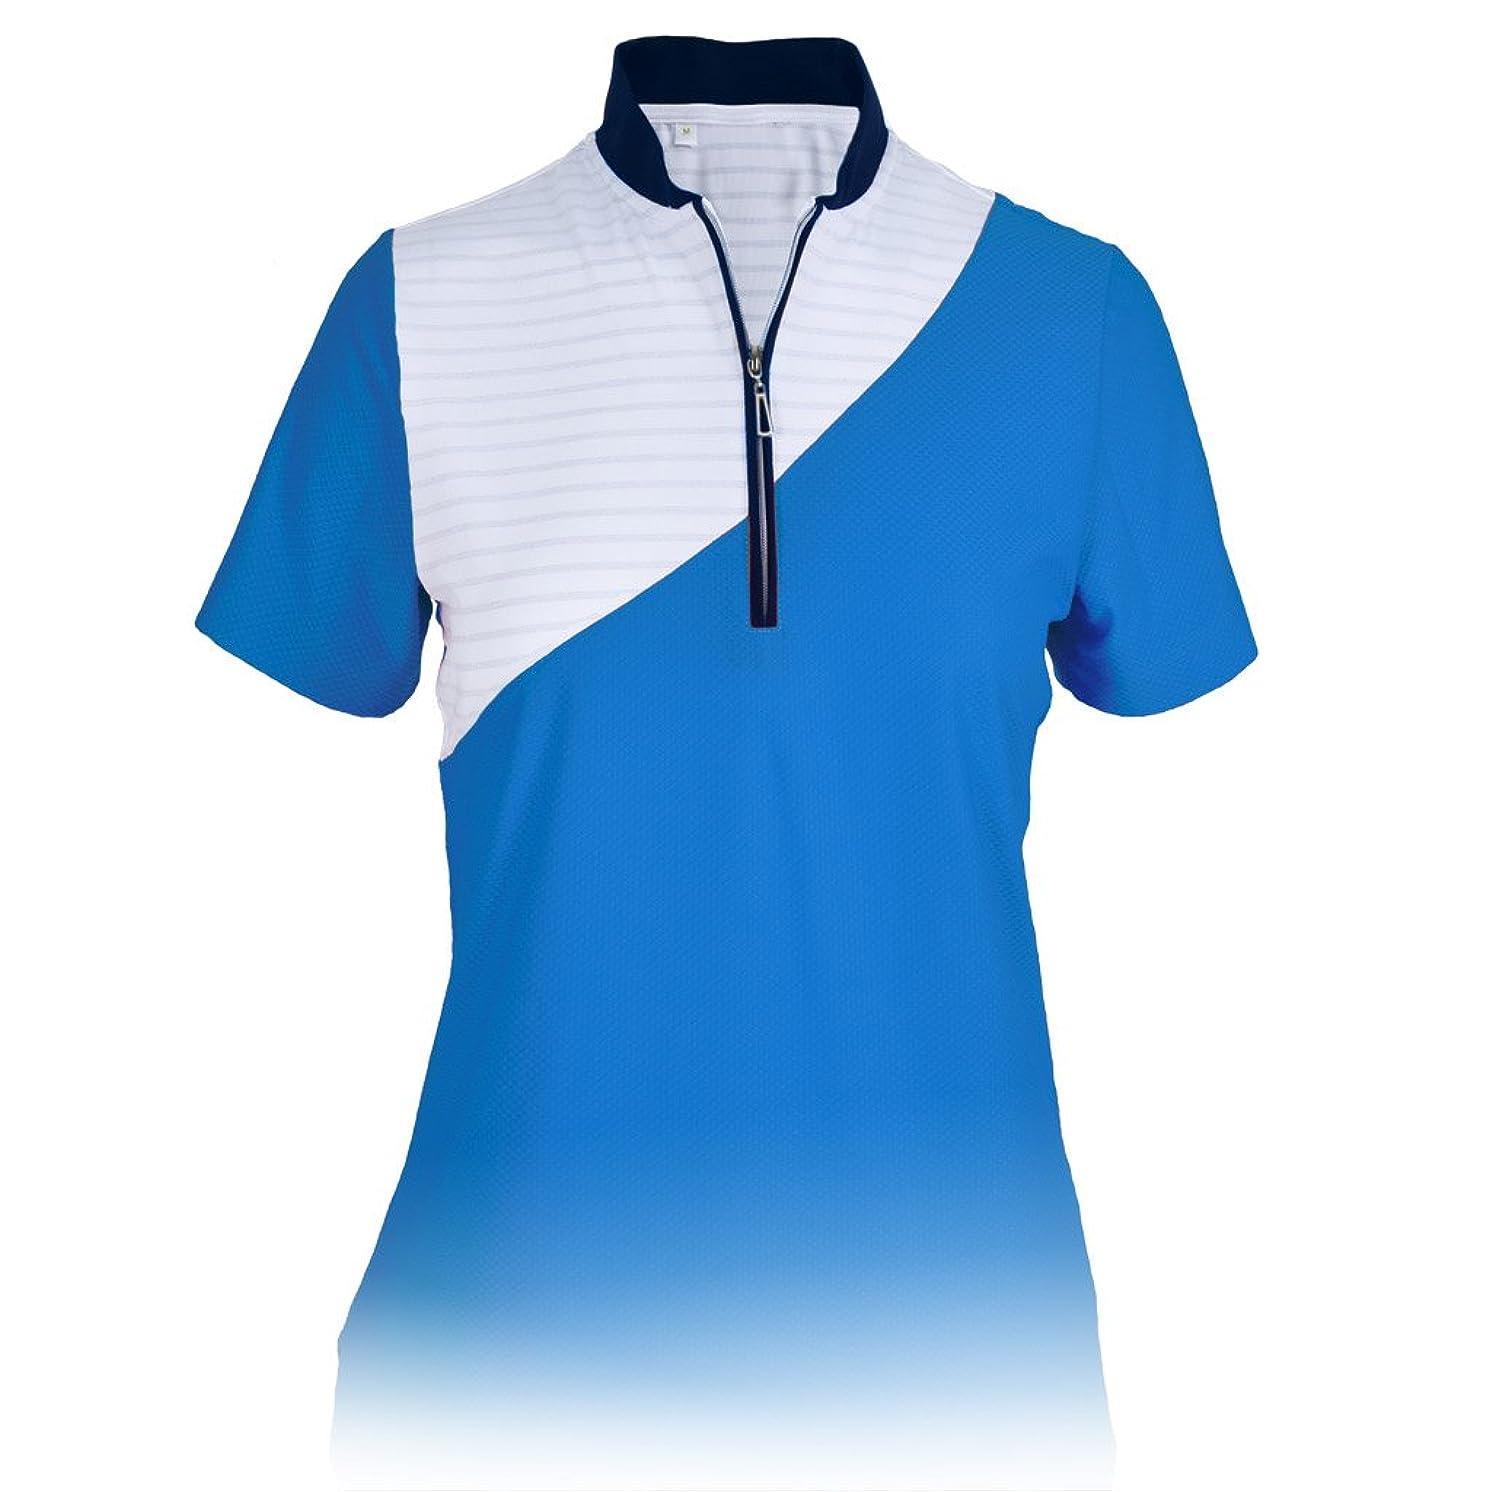 Monterey Club Ladies Dry Swing Shiner Stripe Colorblock Texture Cap Sleeve Shirt #2342